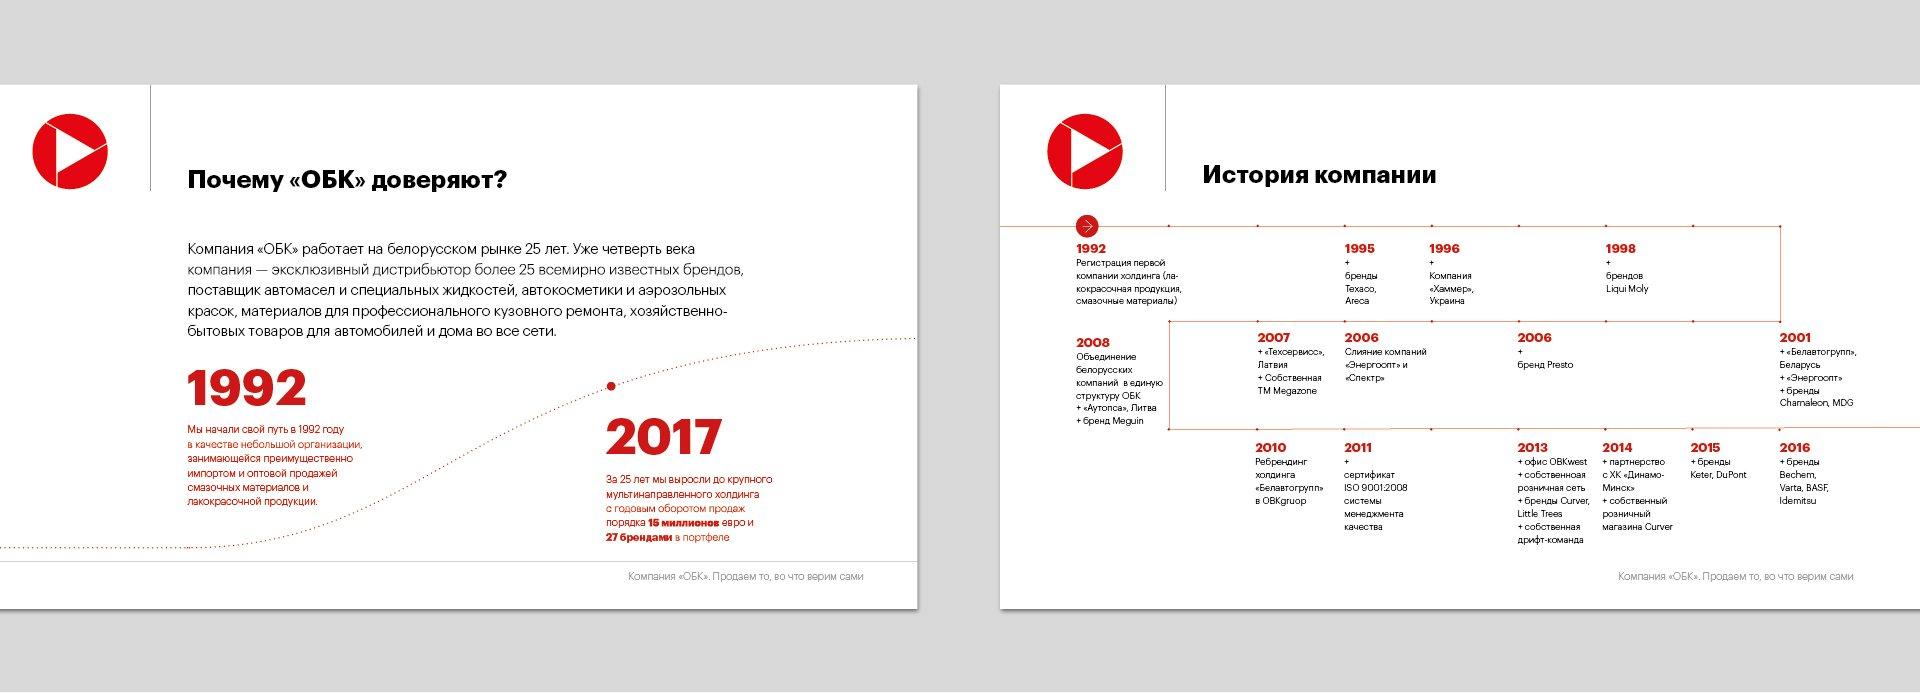 Разработка презентации для холдинга ОБКгрупп